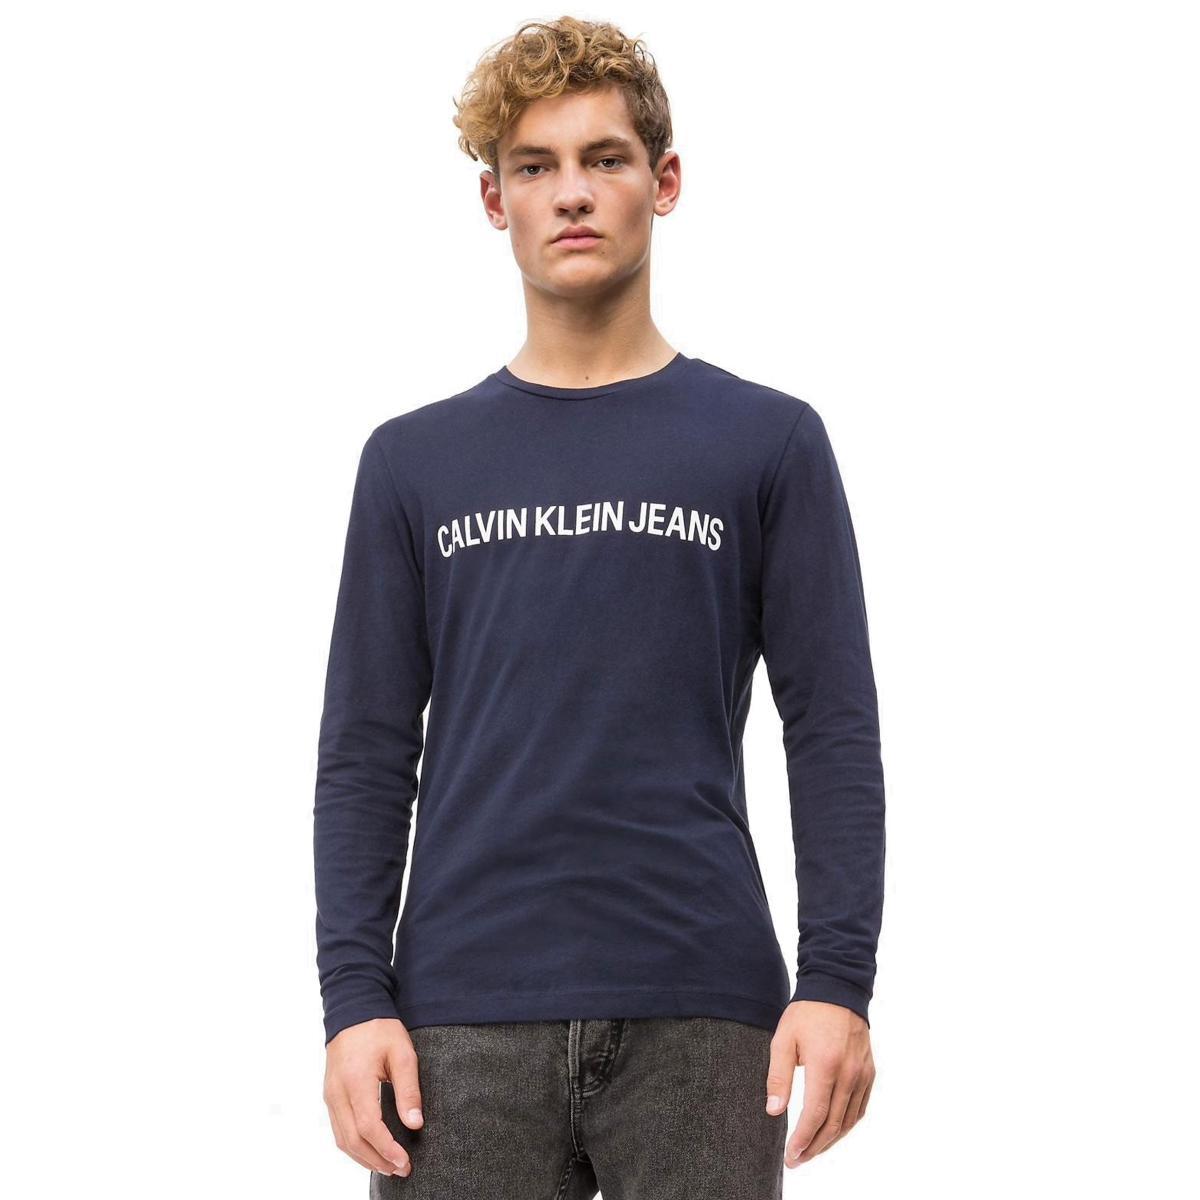 T-shirt slim a maniche lunghe con logo Calvin Klein Jeans da uomo rif. J30J309592